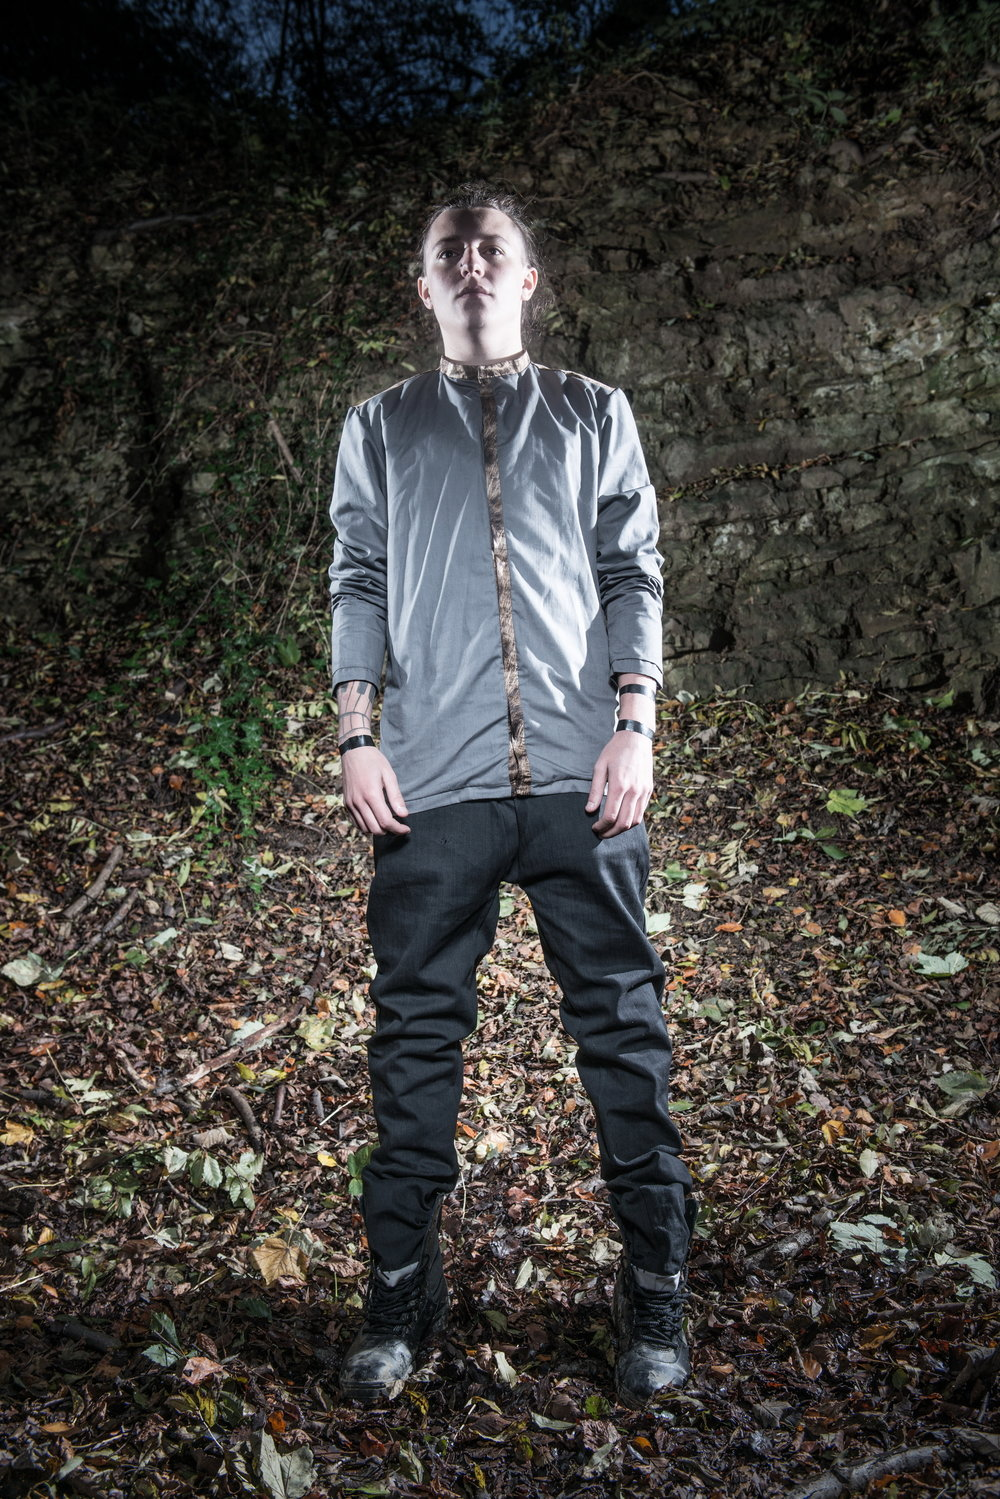 zaramia-ava-zaramiaava-leeds-fashion-designer-ethical-sustainable-tailored-minimalist-versatile-drape-grey-shirt-top-denim-trousers-black-grey-texture-styling-menswear-model-photoshoot-location-2